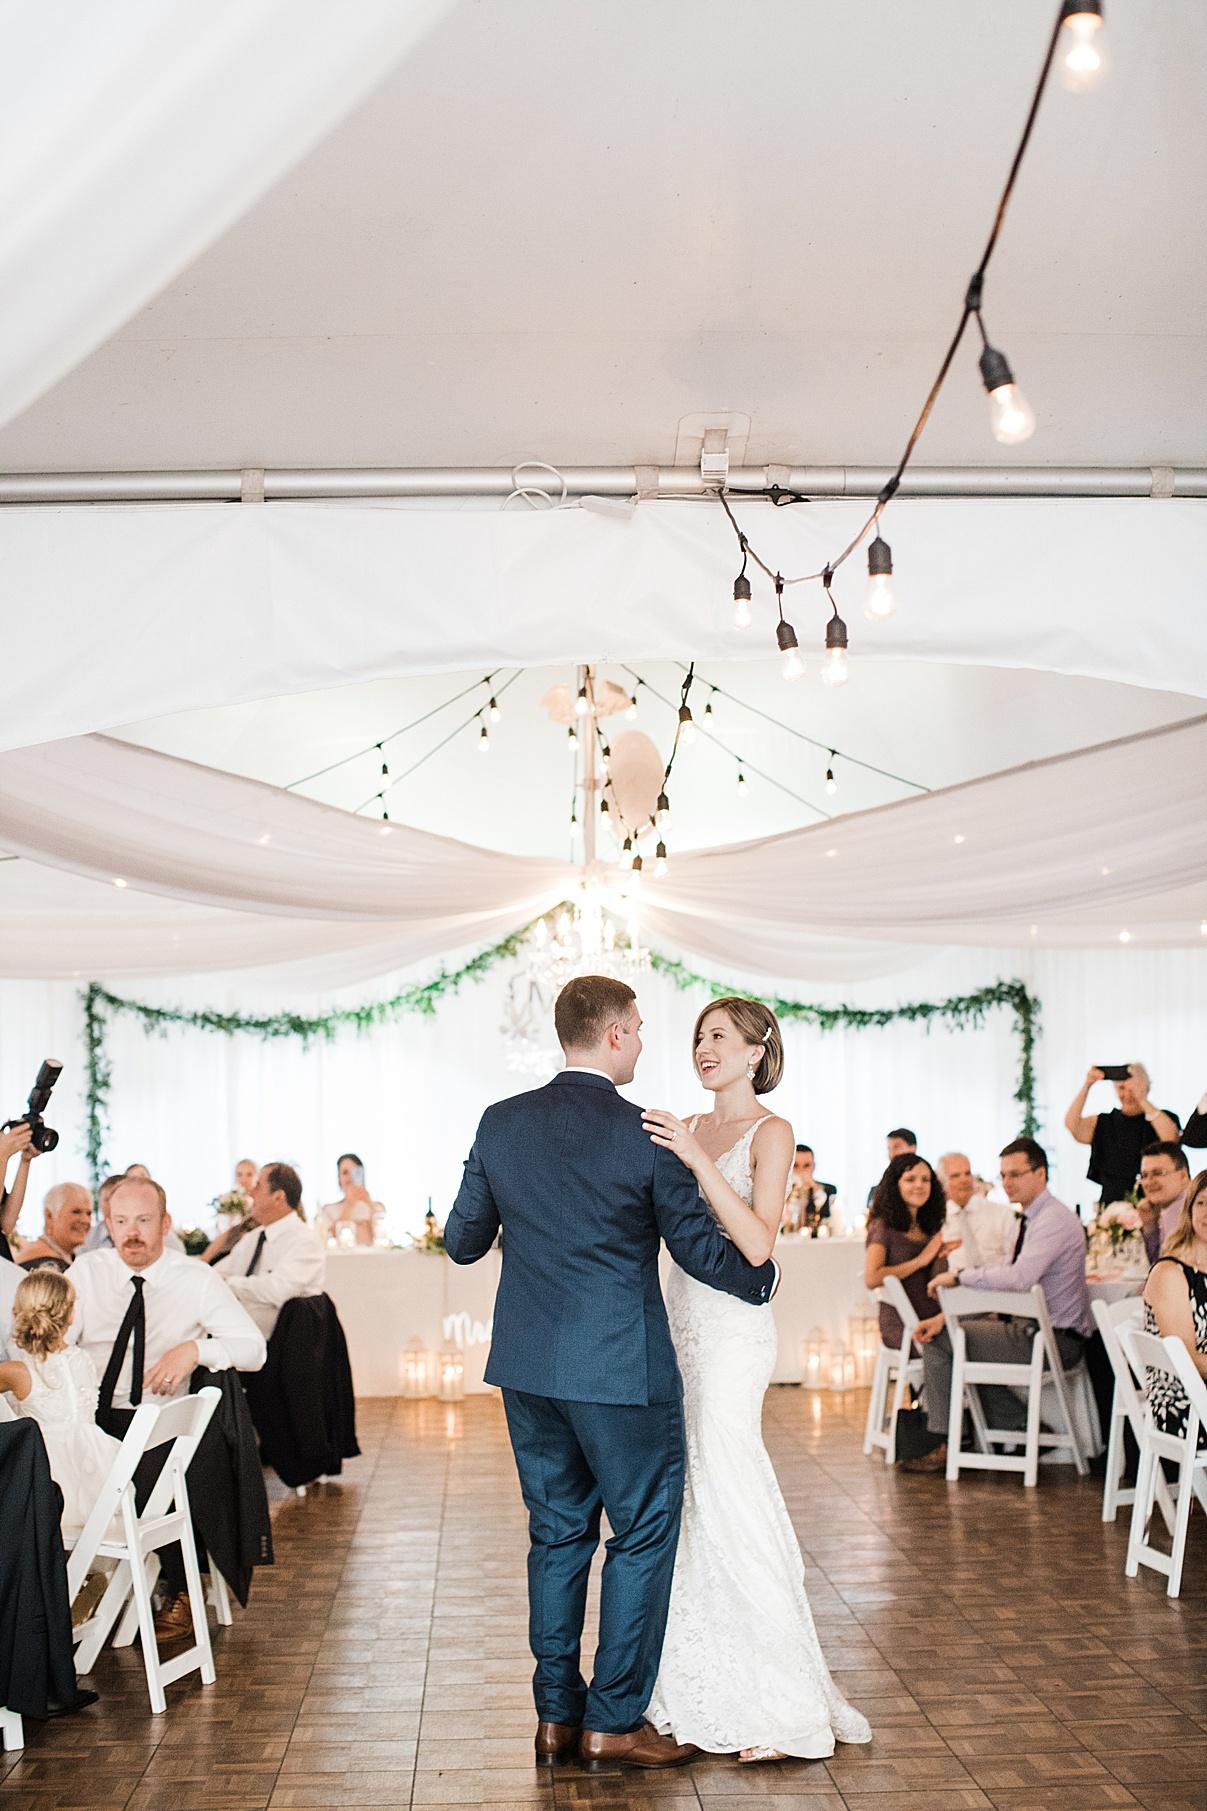 Groom and bride dancing first dance| Harding Waterfront Estate Wedding| Ontario wedding photographer| Toronto wedding photographer| 3 Photography | 3photography.ca